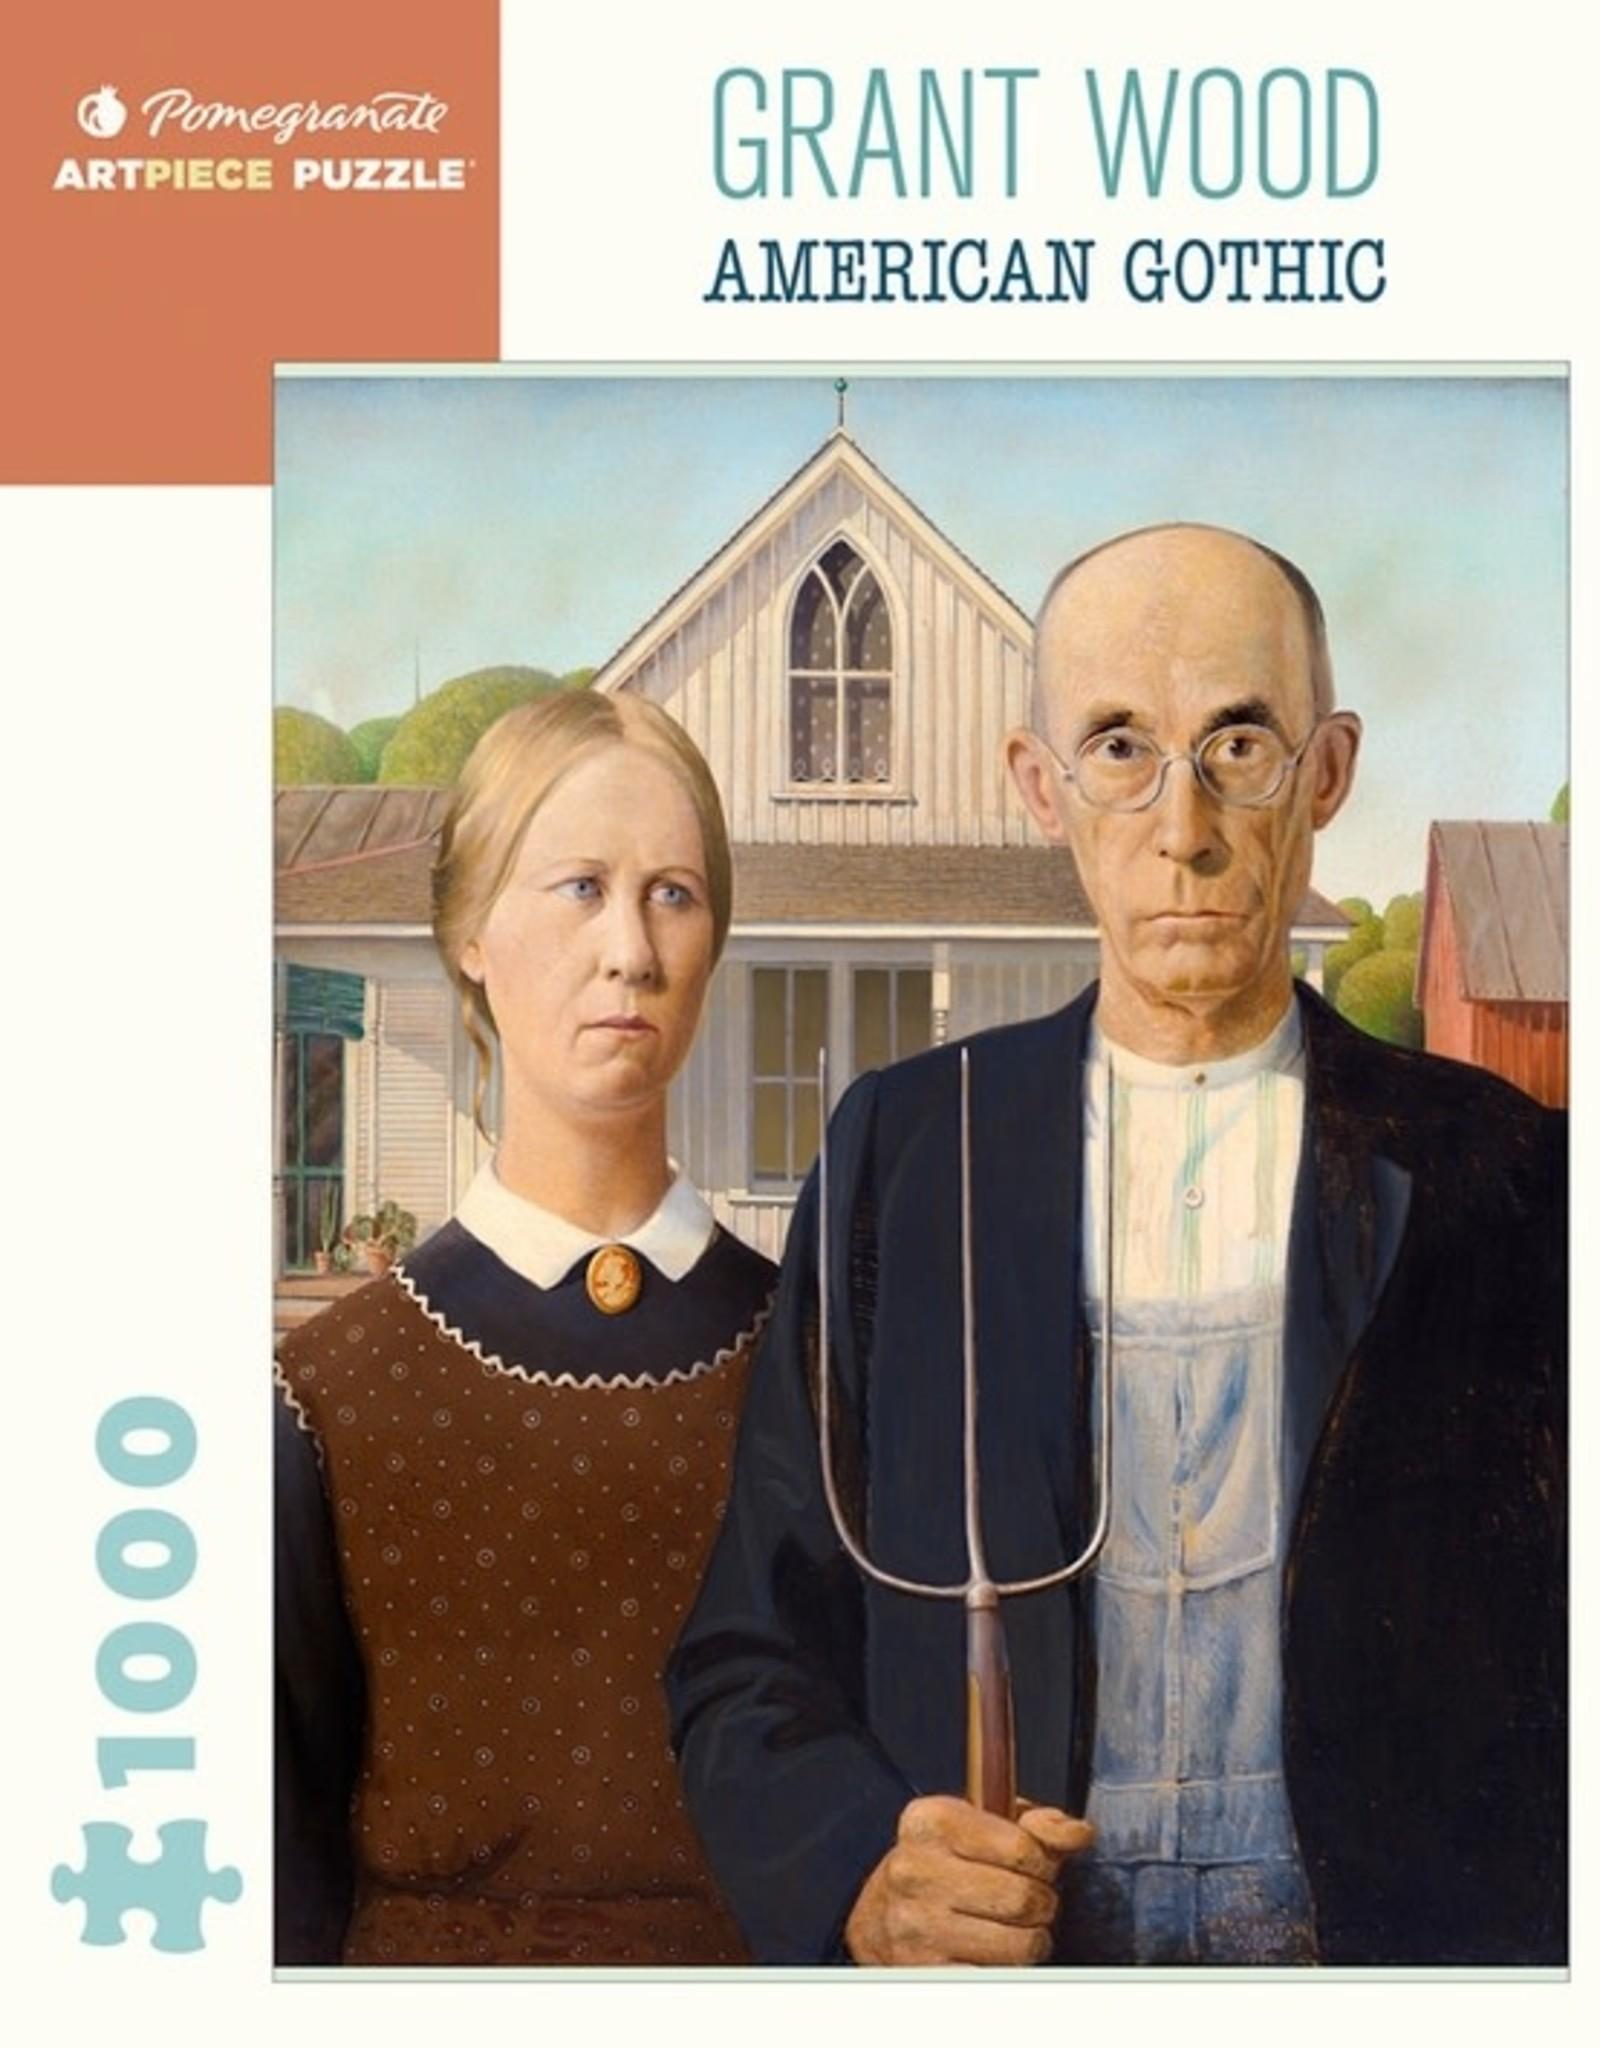 Pomegranate 1000 pc Grant Wood: American Gothic Puzzle